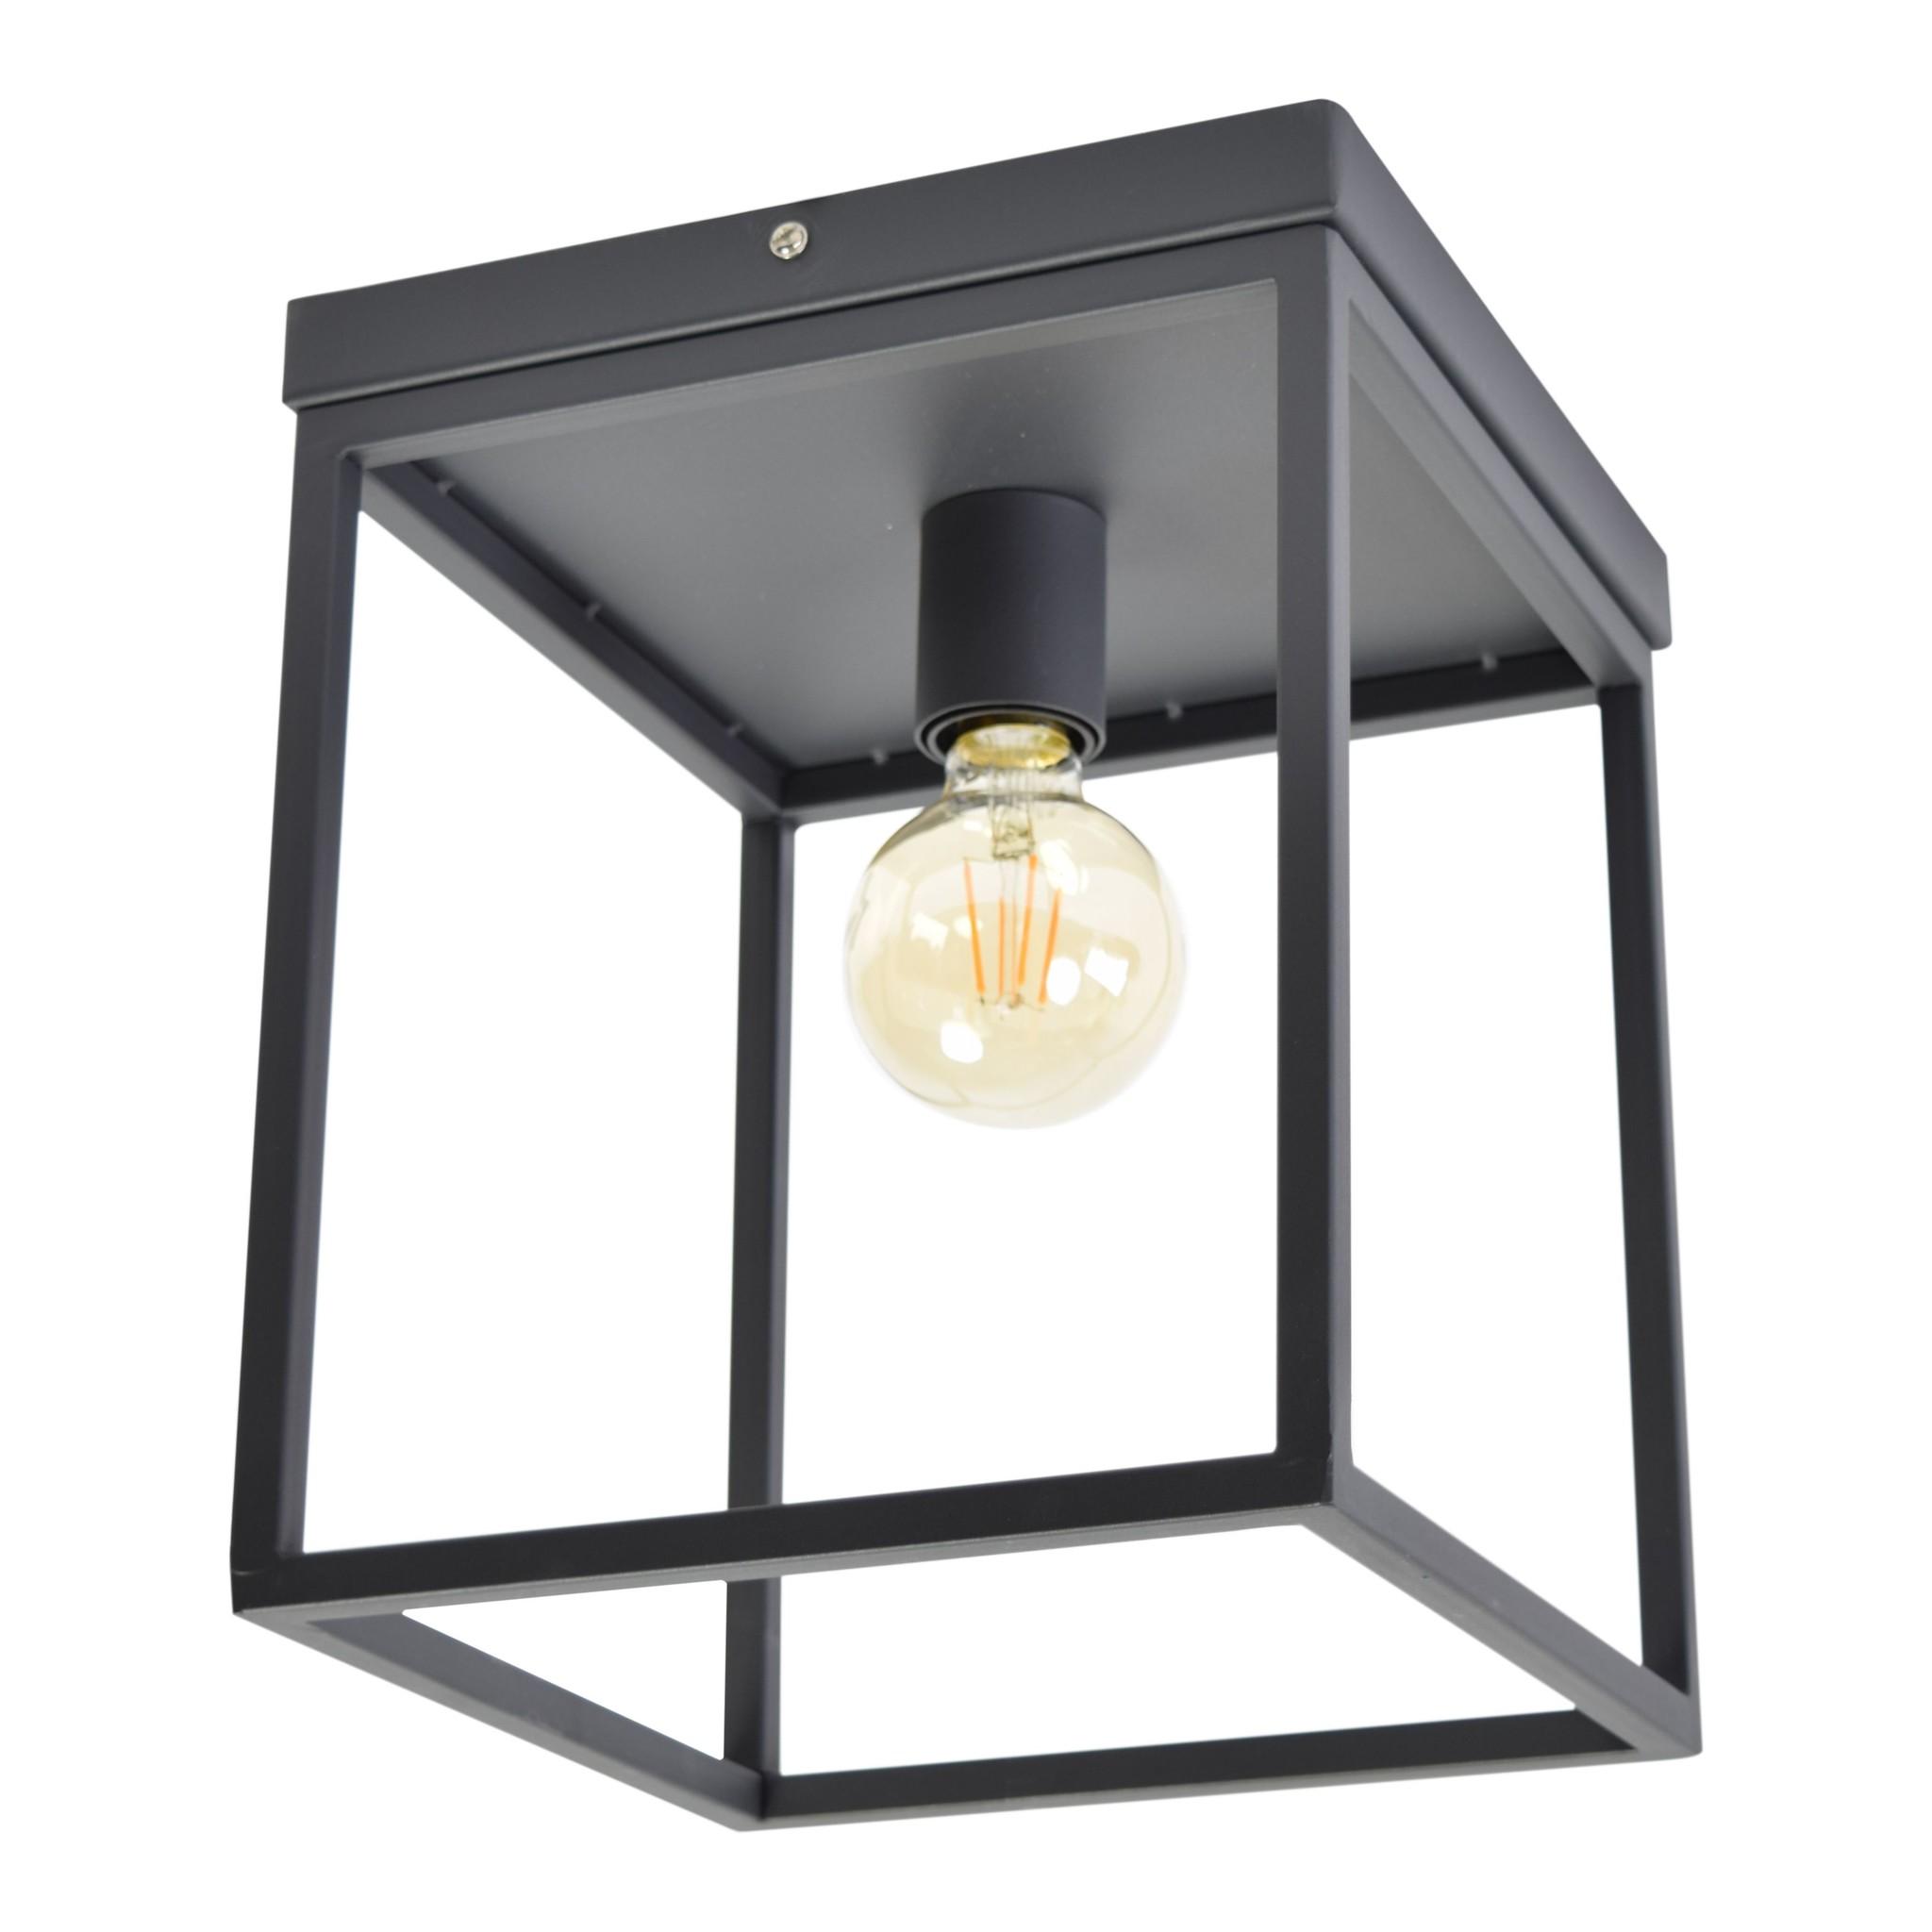 Urban Interiors Plafondlamp Frame B 25 cm H 31 cm Zwart